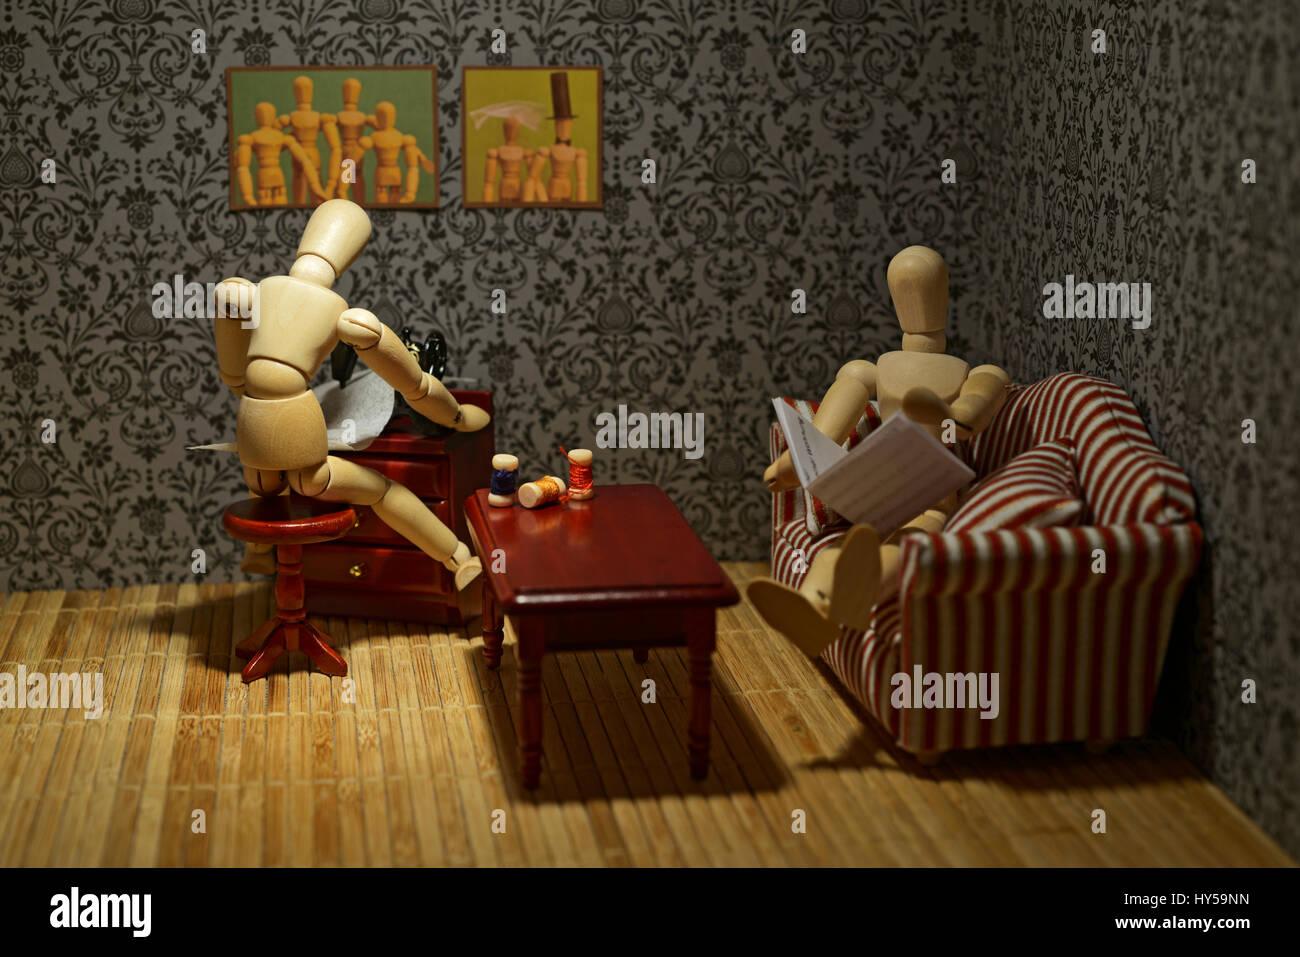 Das Leben von Holzfiguren - Familie leben, Alltag Stockbild